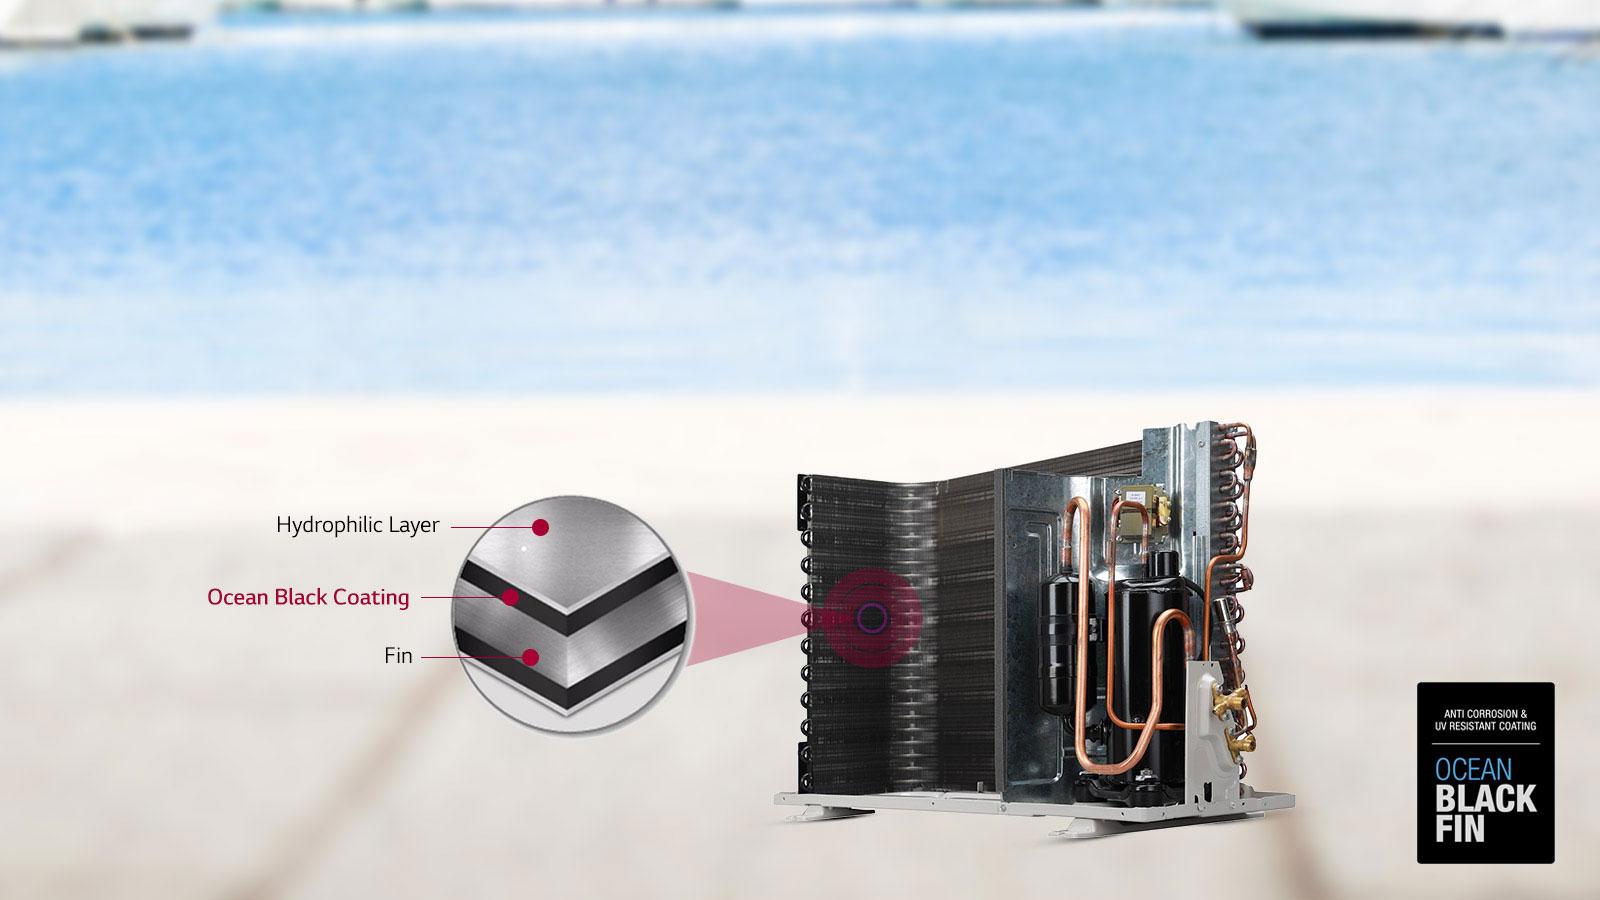 LG LS-Q18BNYD Ocean Black Fin